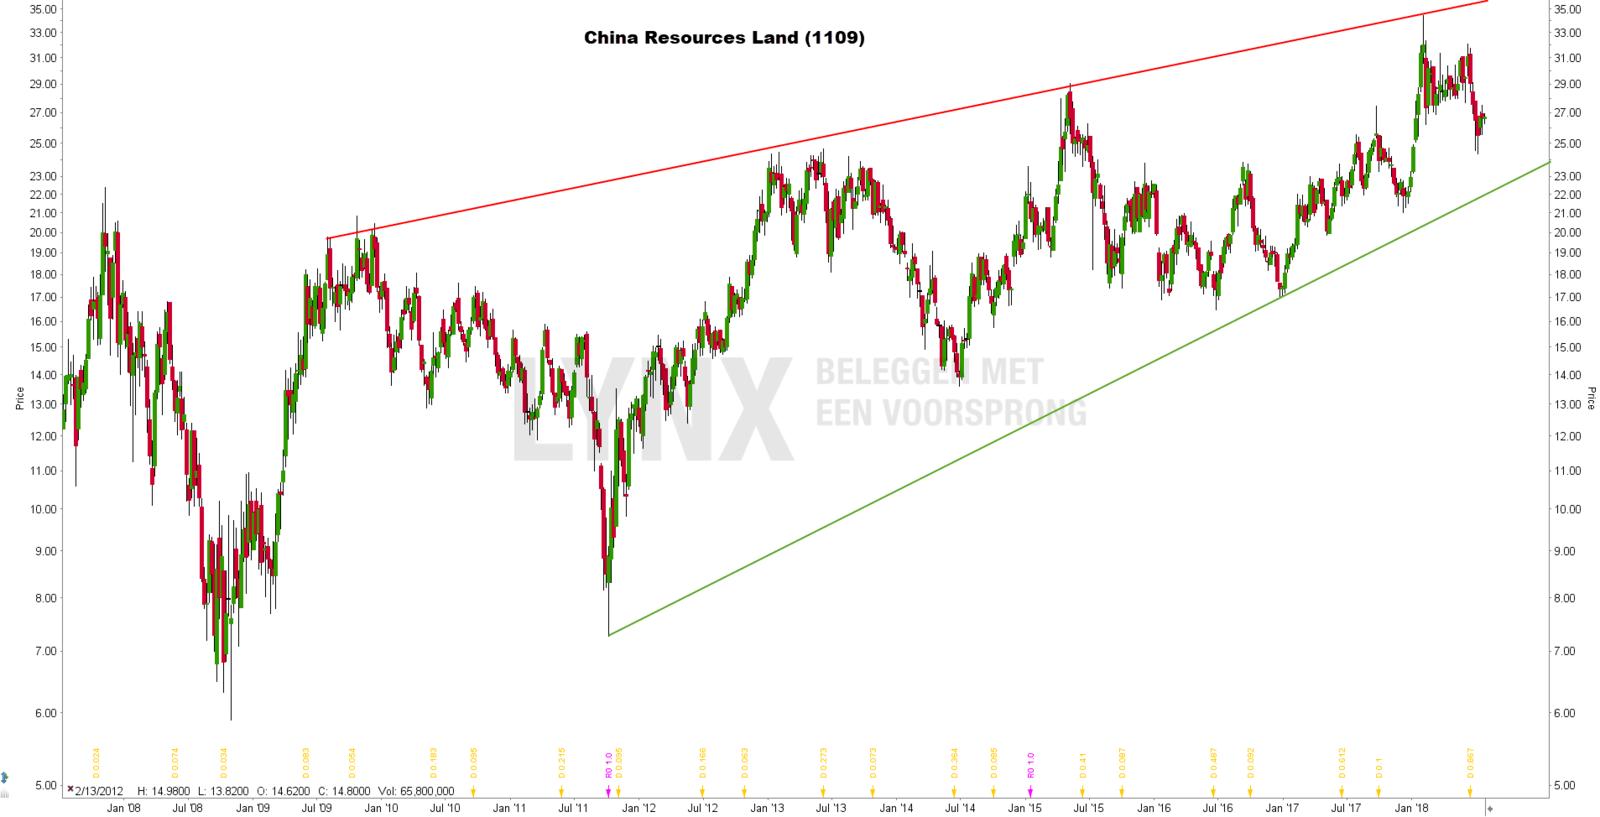 Beste Chinese aandelen: China Resources Land